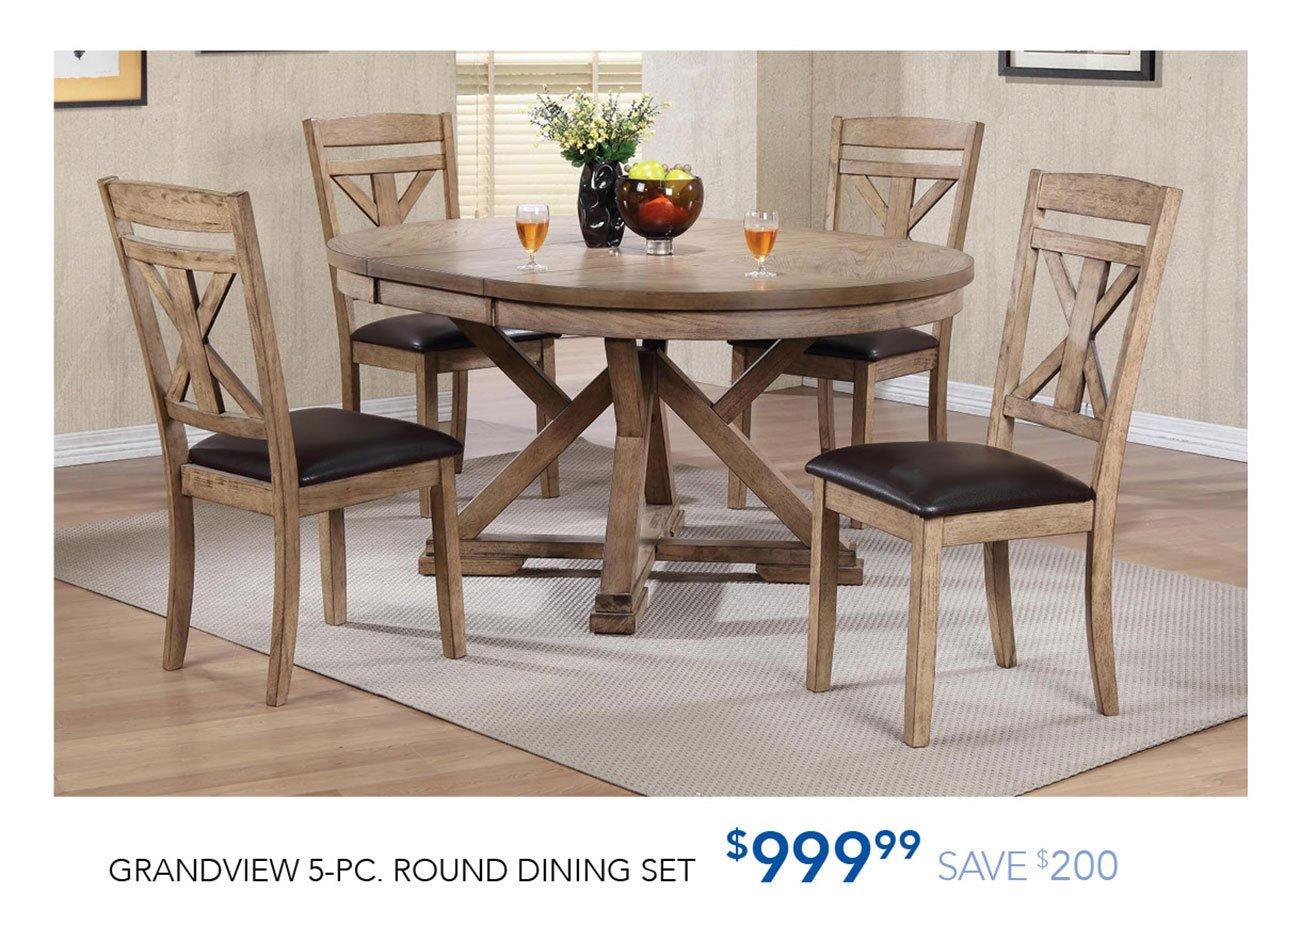 Grandview-round-dining-set